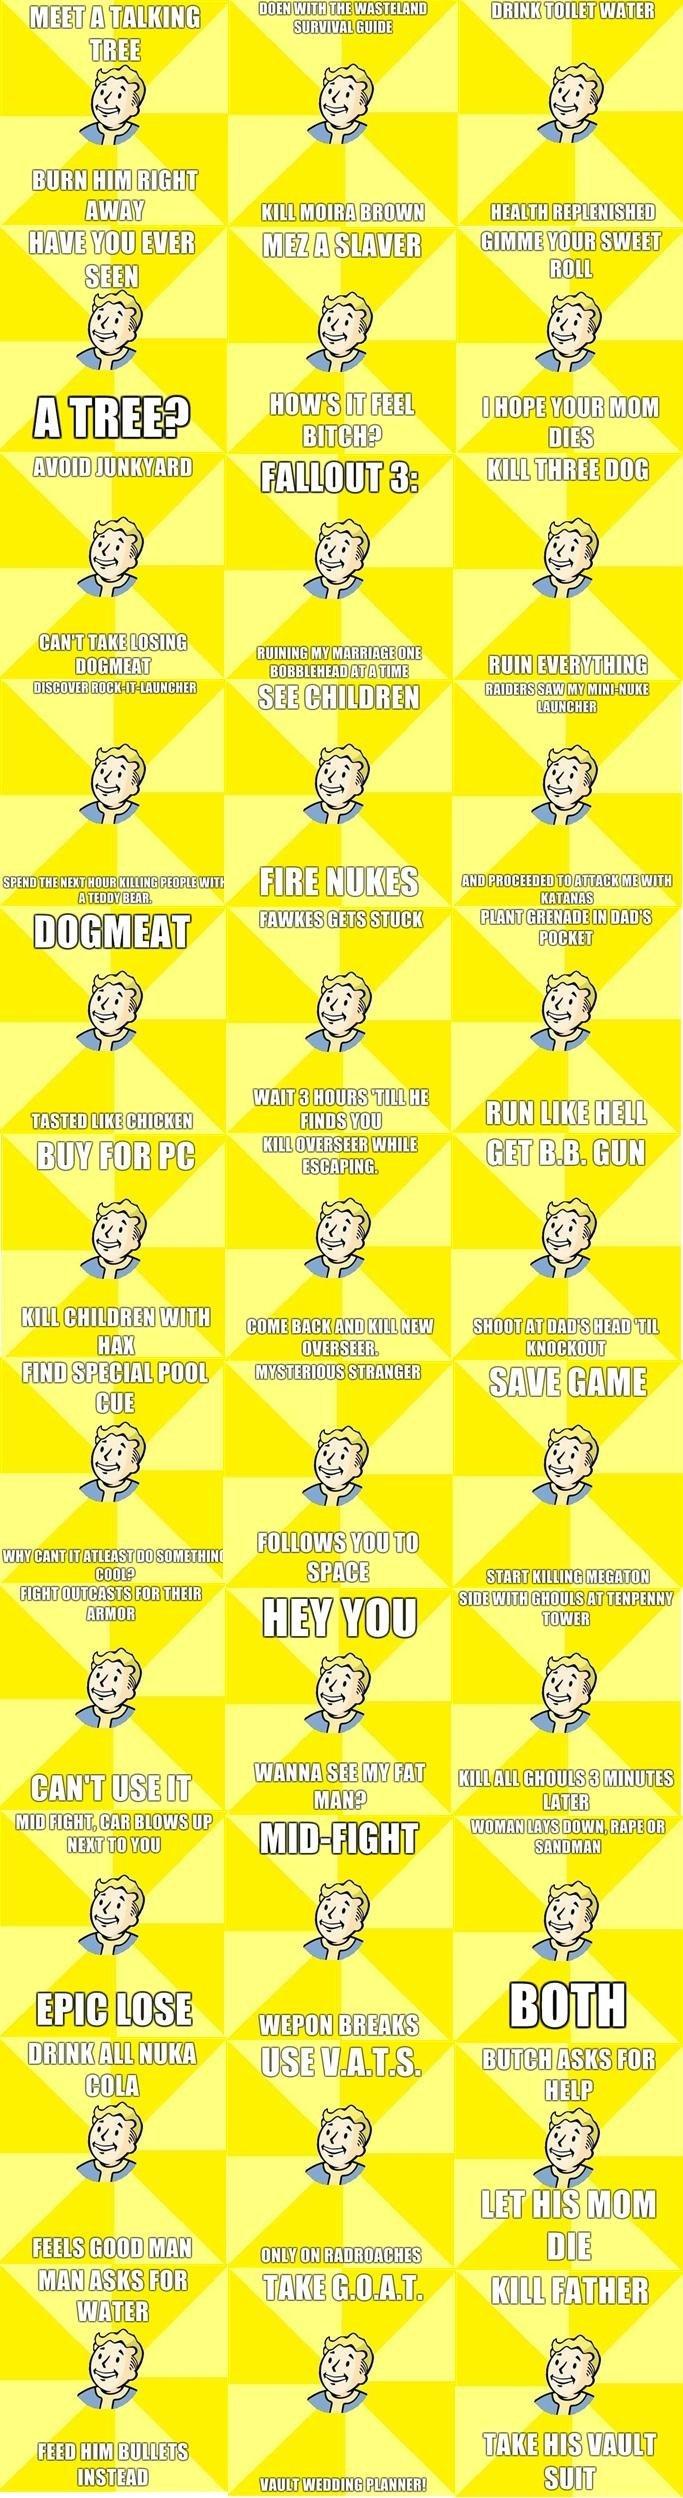 "Fallout Compilation. Fallout Compilation, enjoy. fii"" aii! Cirillo) 2 SERGE lap lolgif] [ iigc WEE] bras, Mlg) awaii""' , tir Efl) flf?. Make More NOW Fallout Compilat"